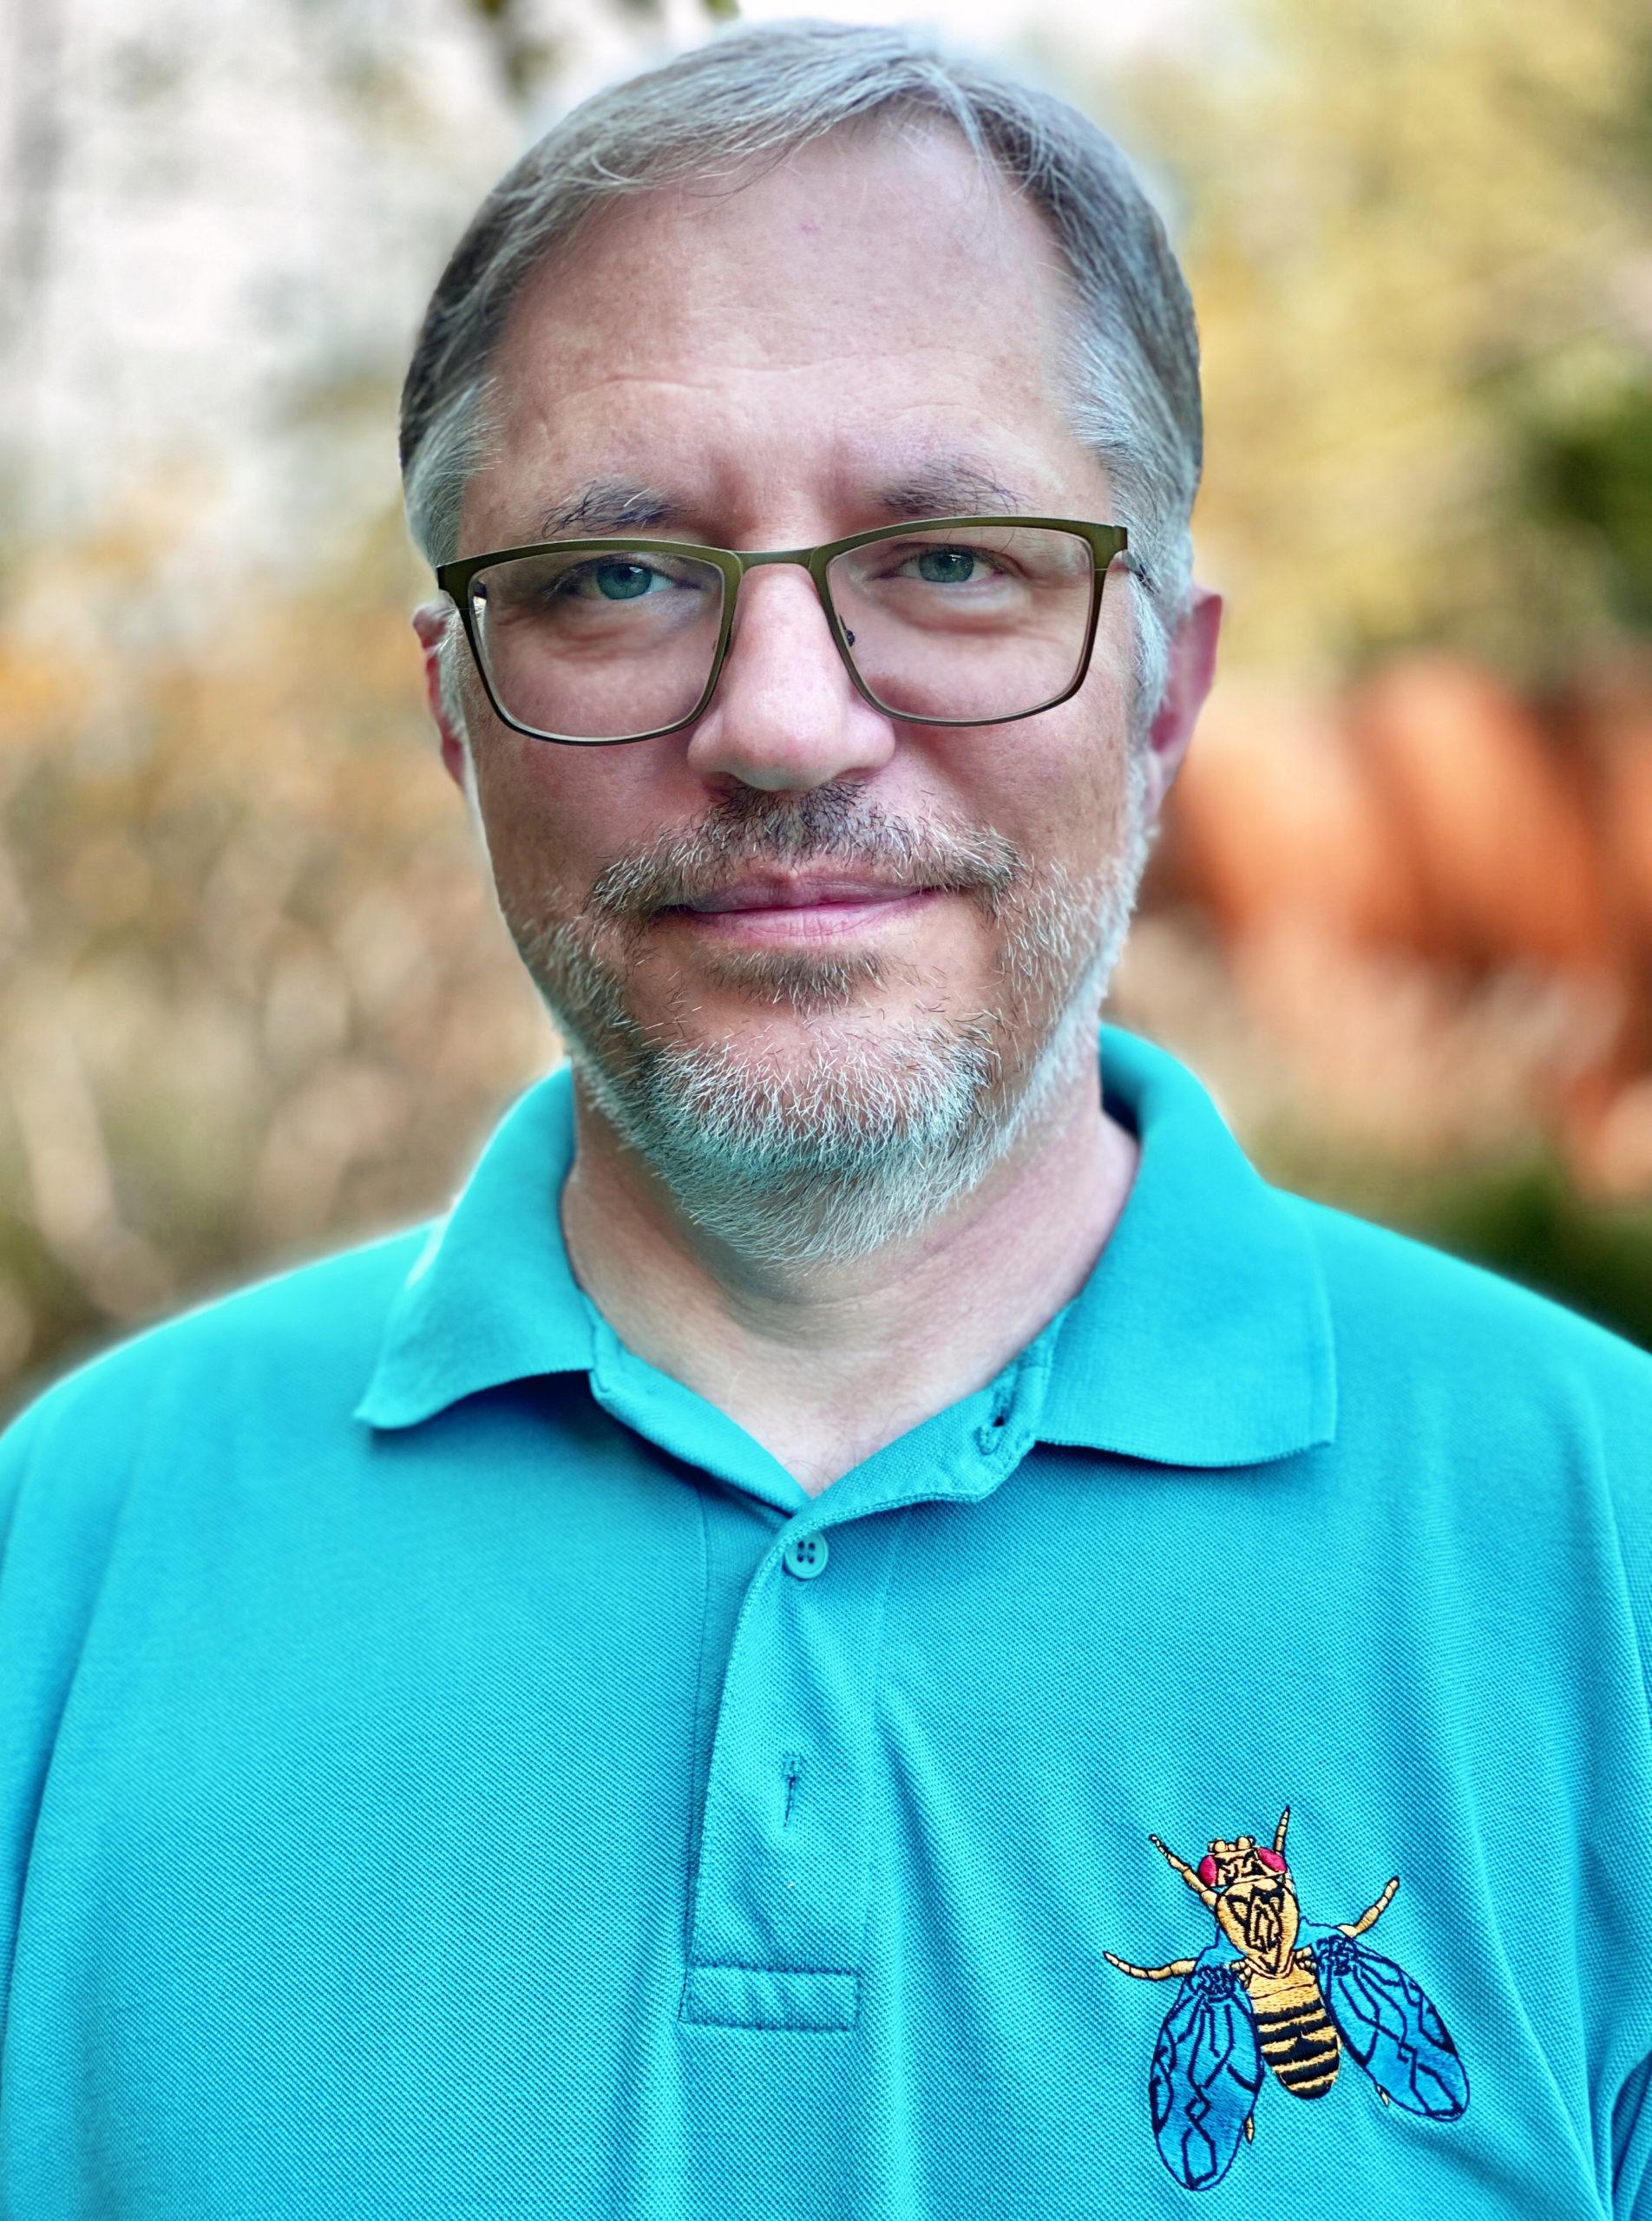 Jeff Sekelsky